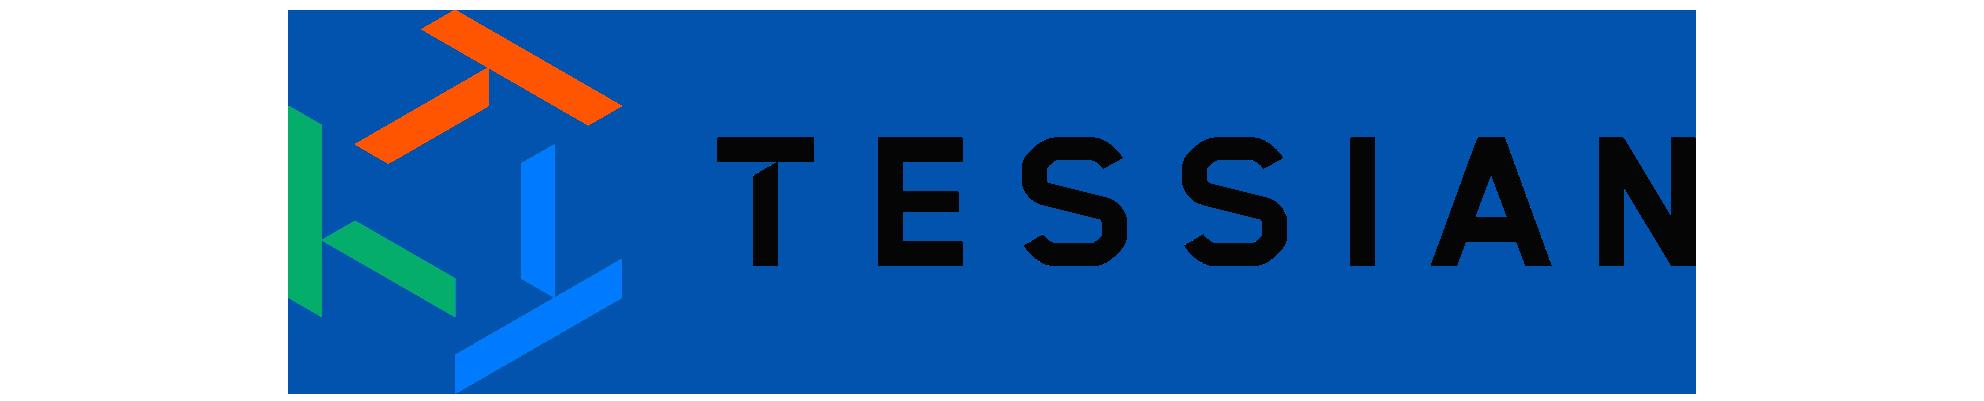 Tessian logo new photoshop